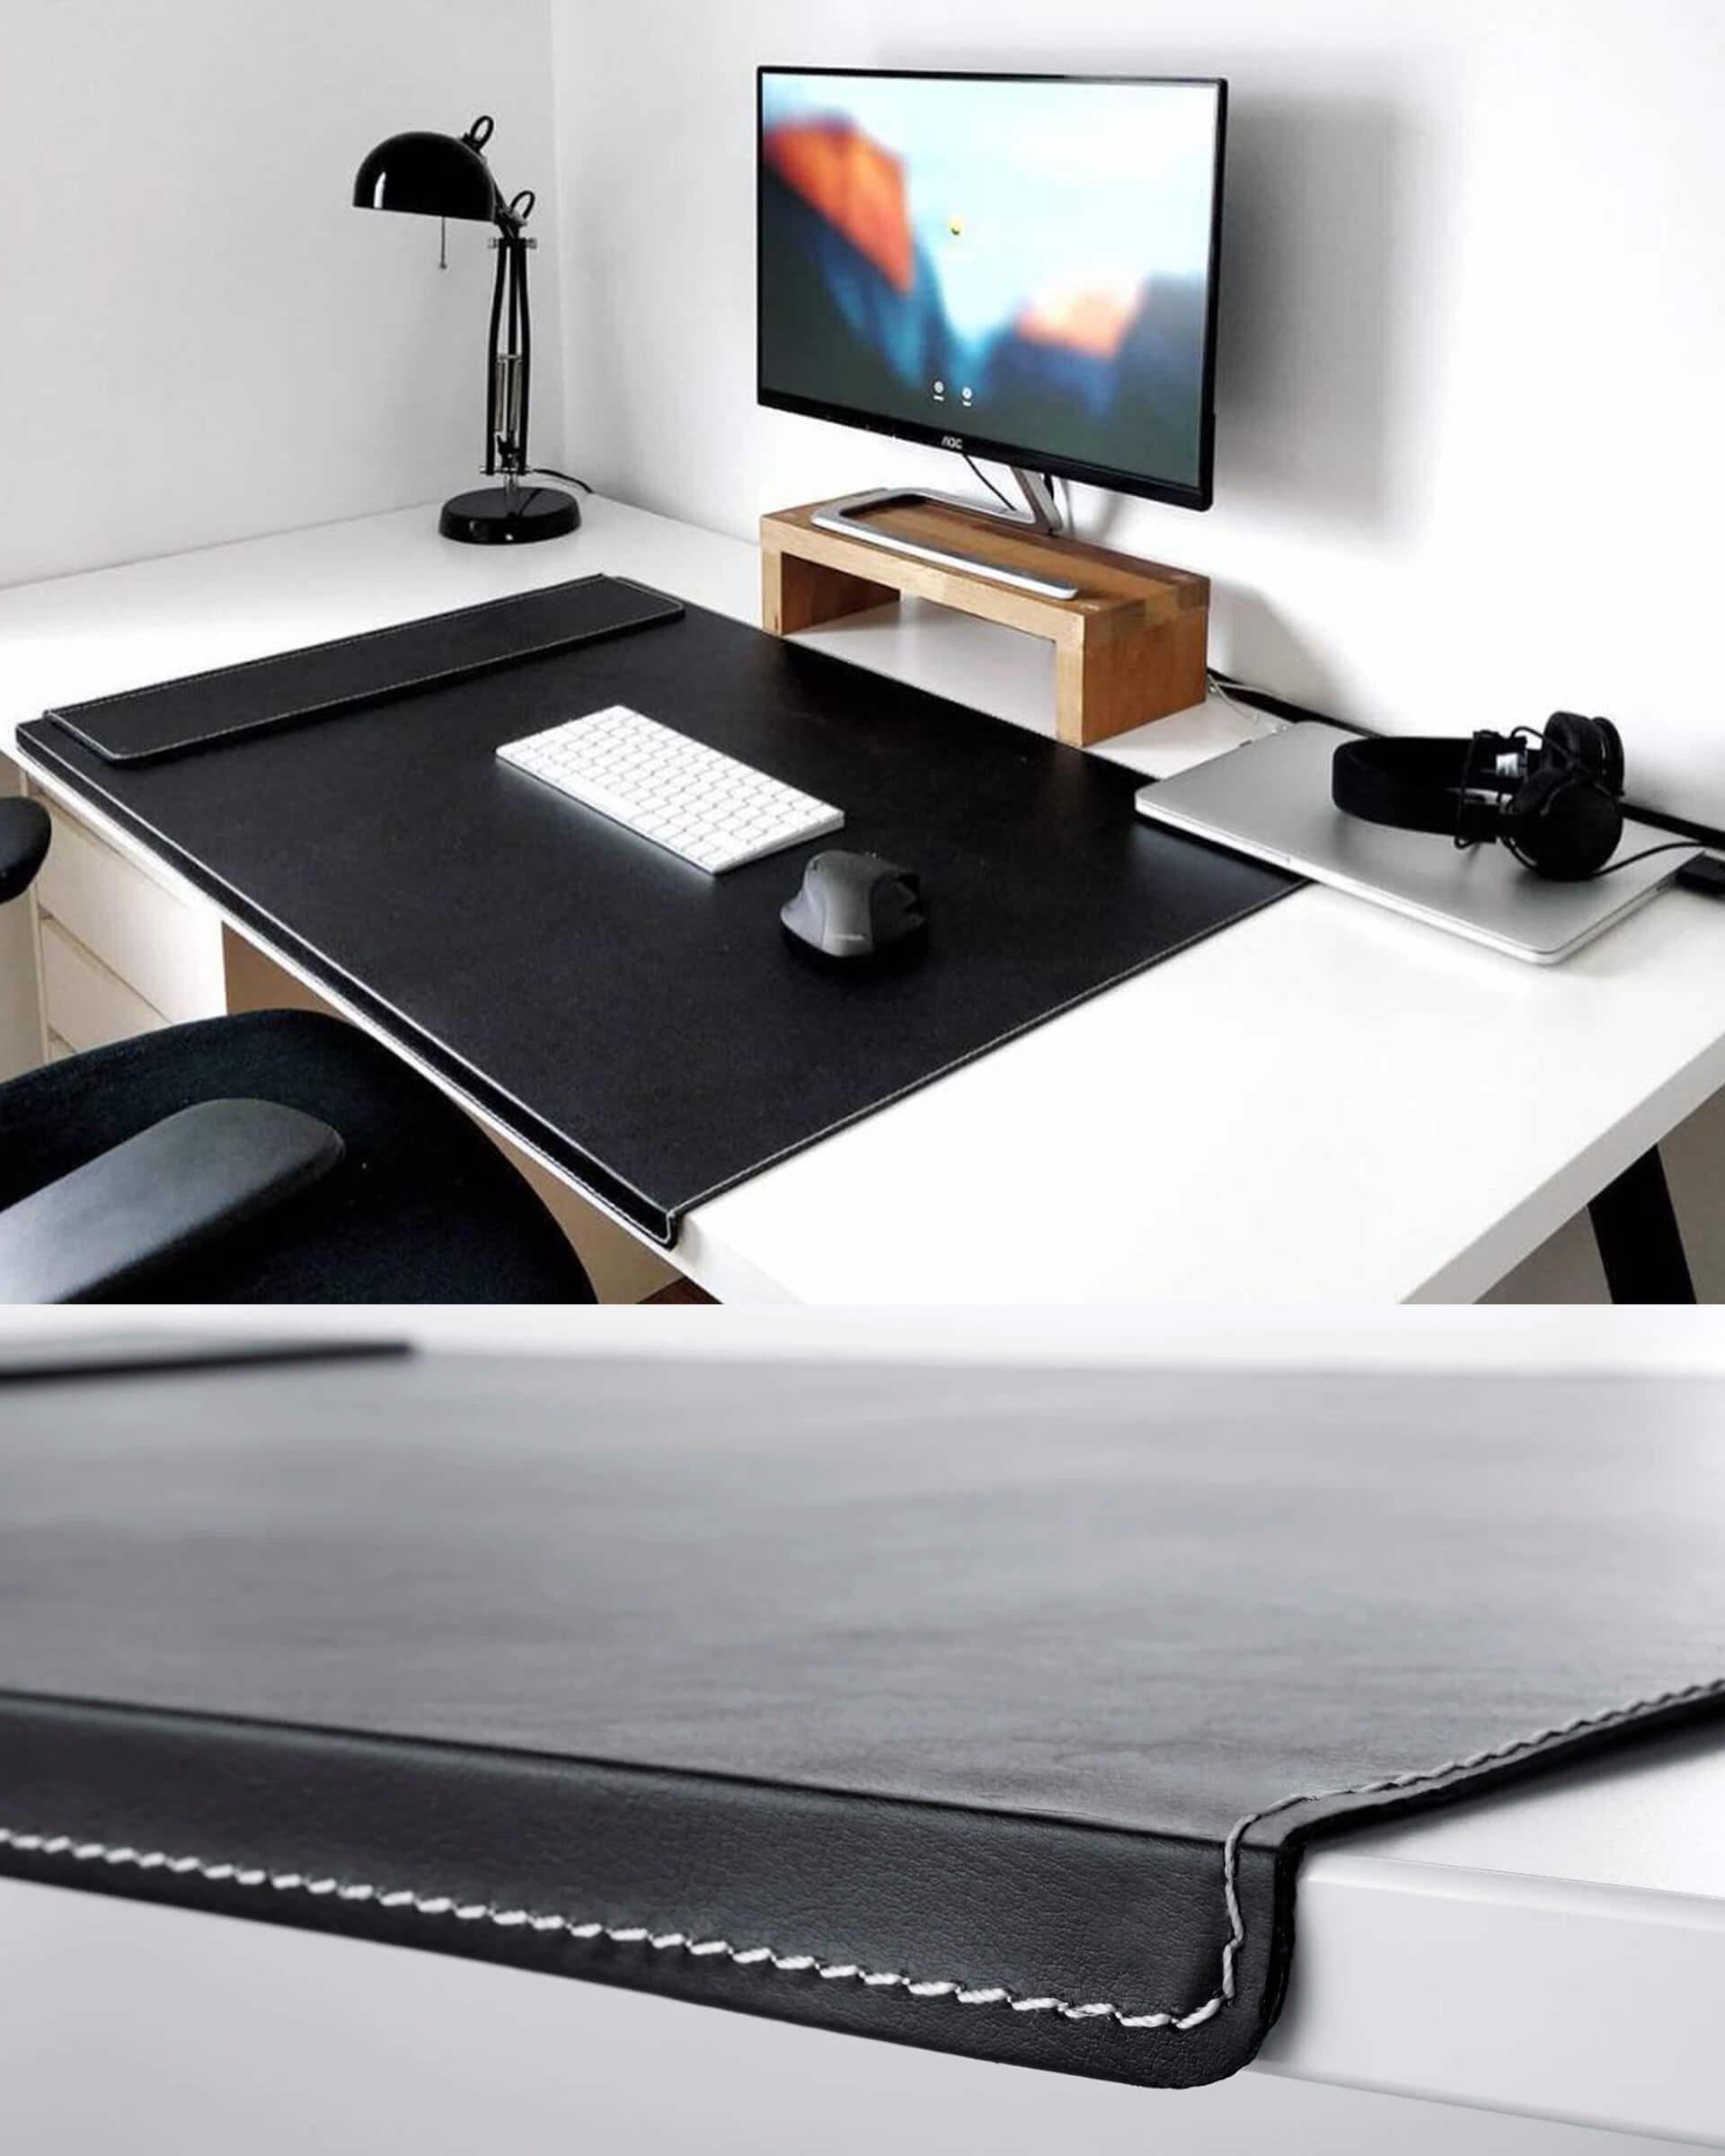 Desk Edge Pad - IKEA Rissla